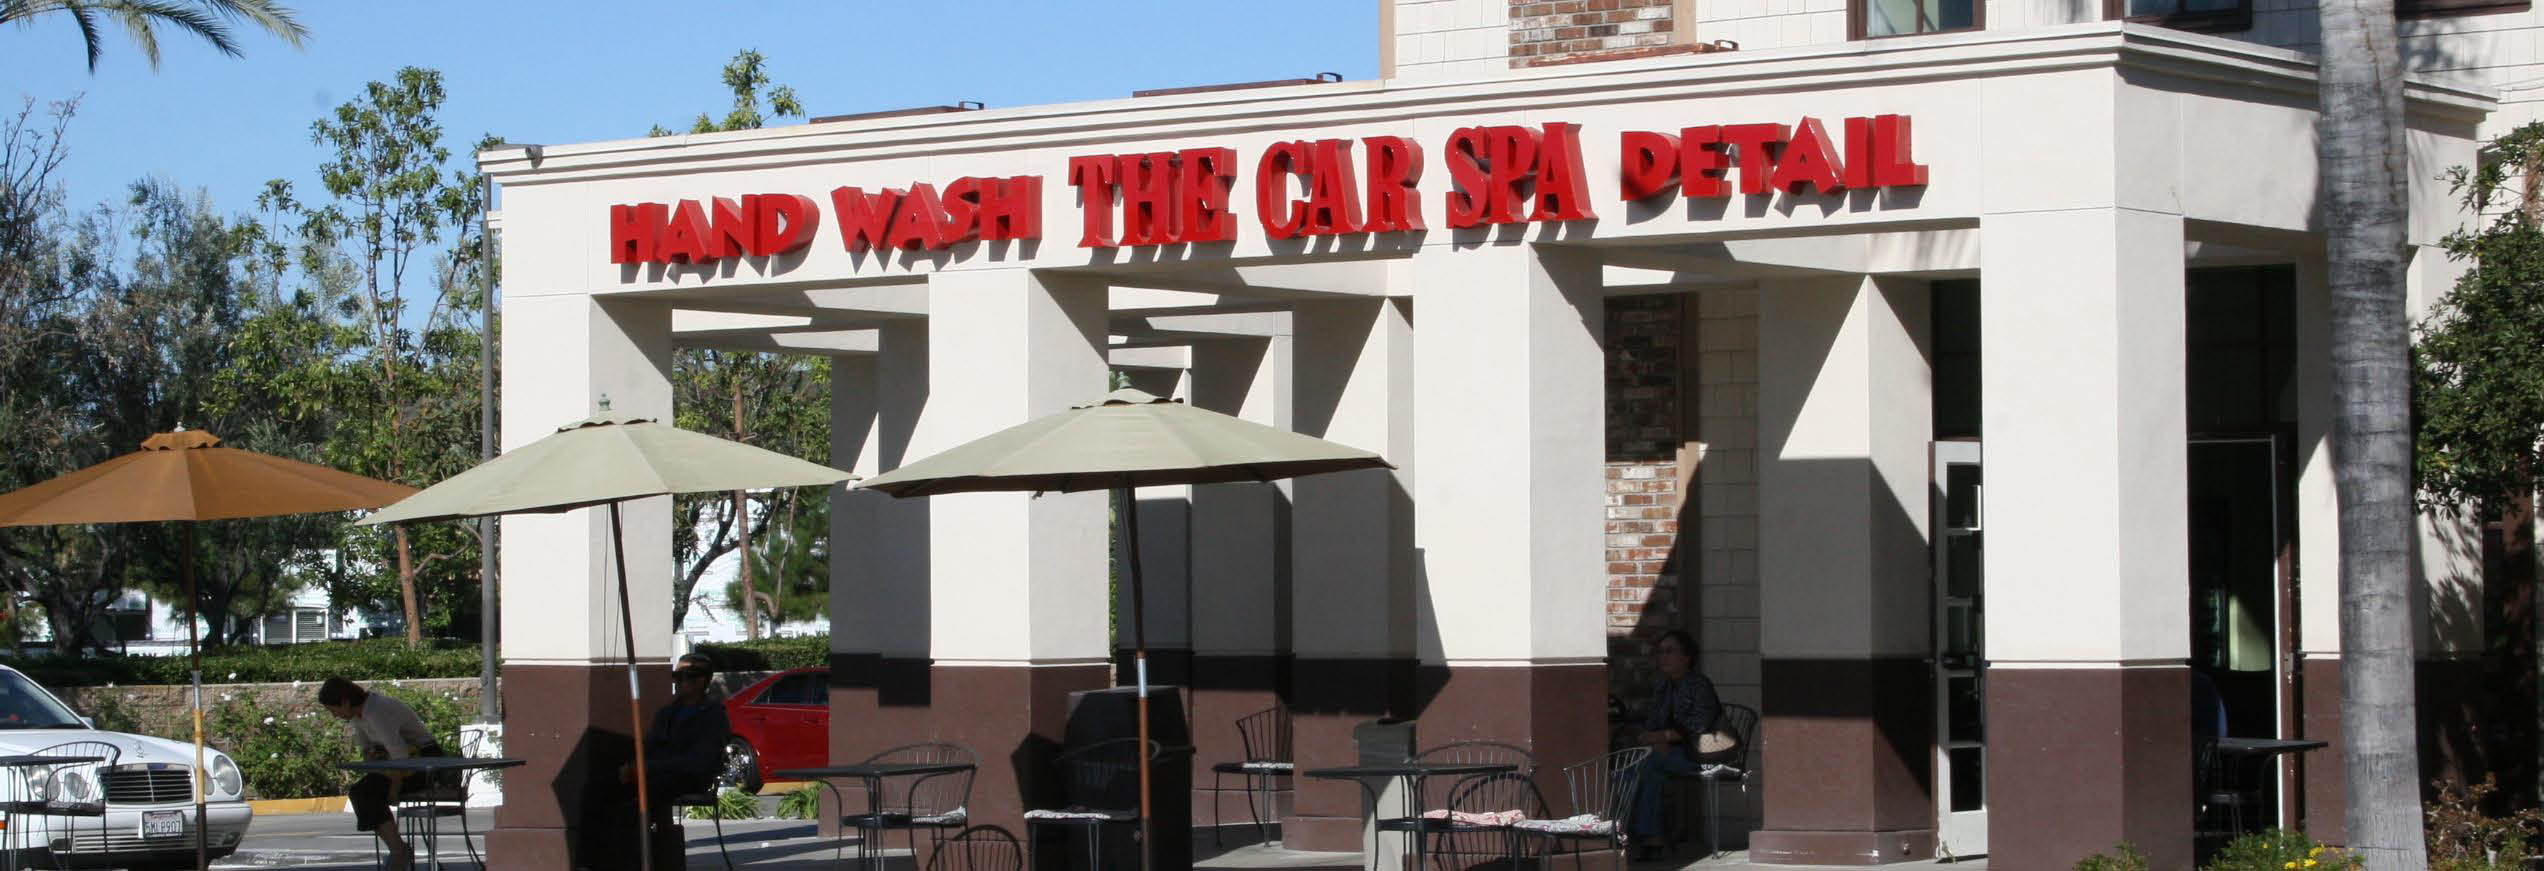 car spa hand wash irvine ca car wash coupons near me